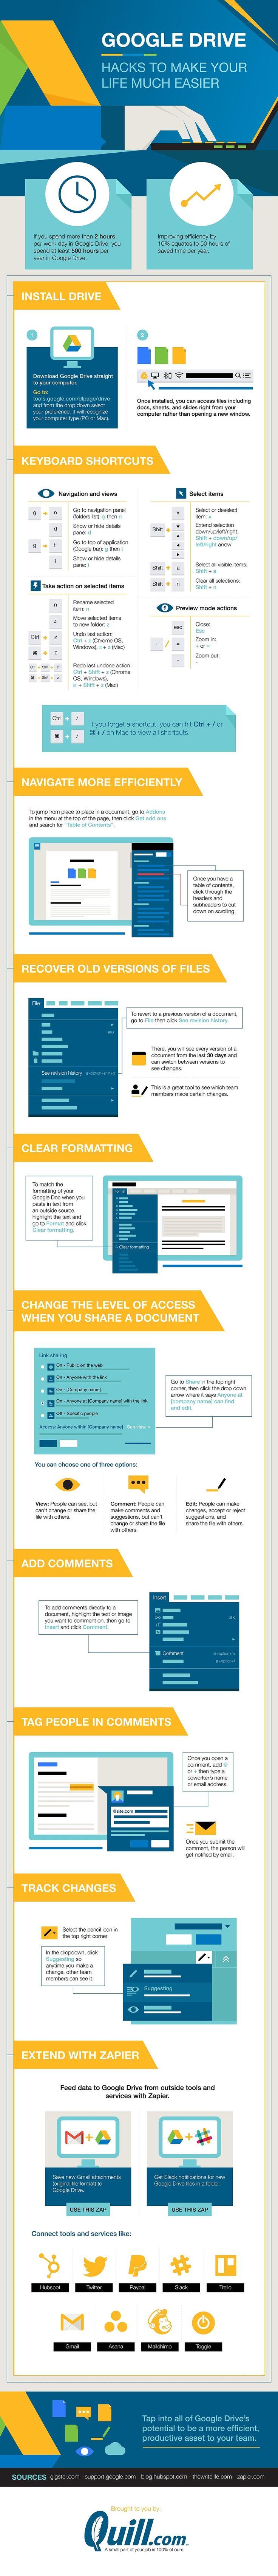 Google drive hacks to make your life much easier #infographic #Google #GoogleDrive #Hacks #Shortcuts #Internet